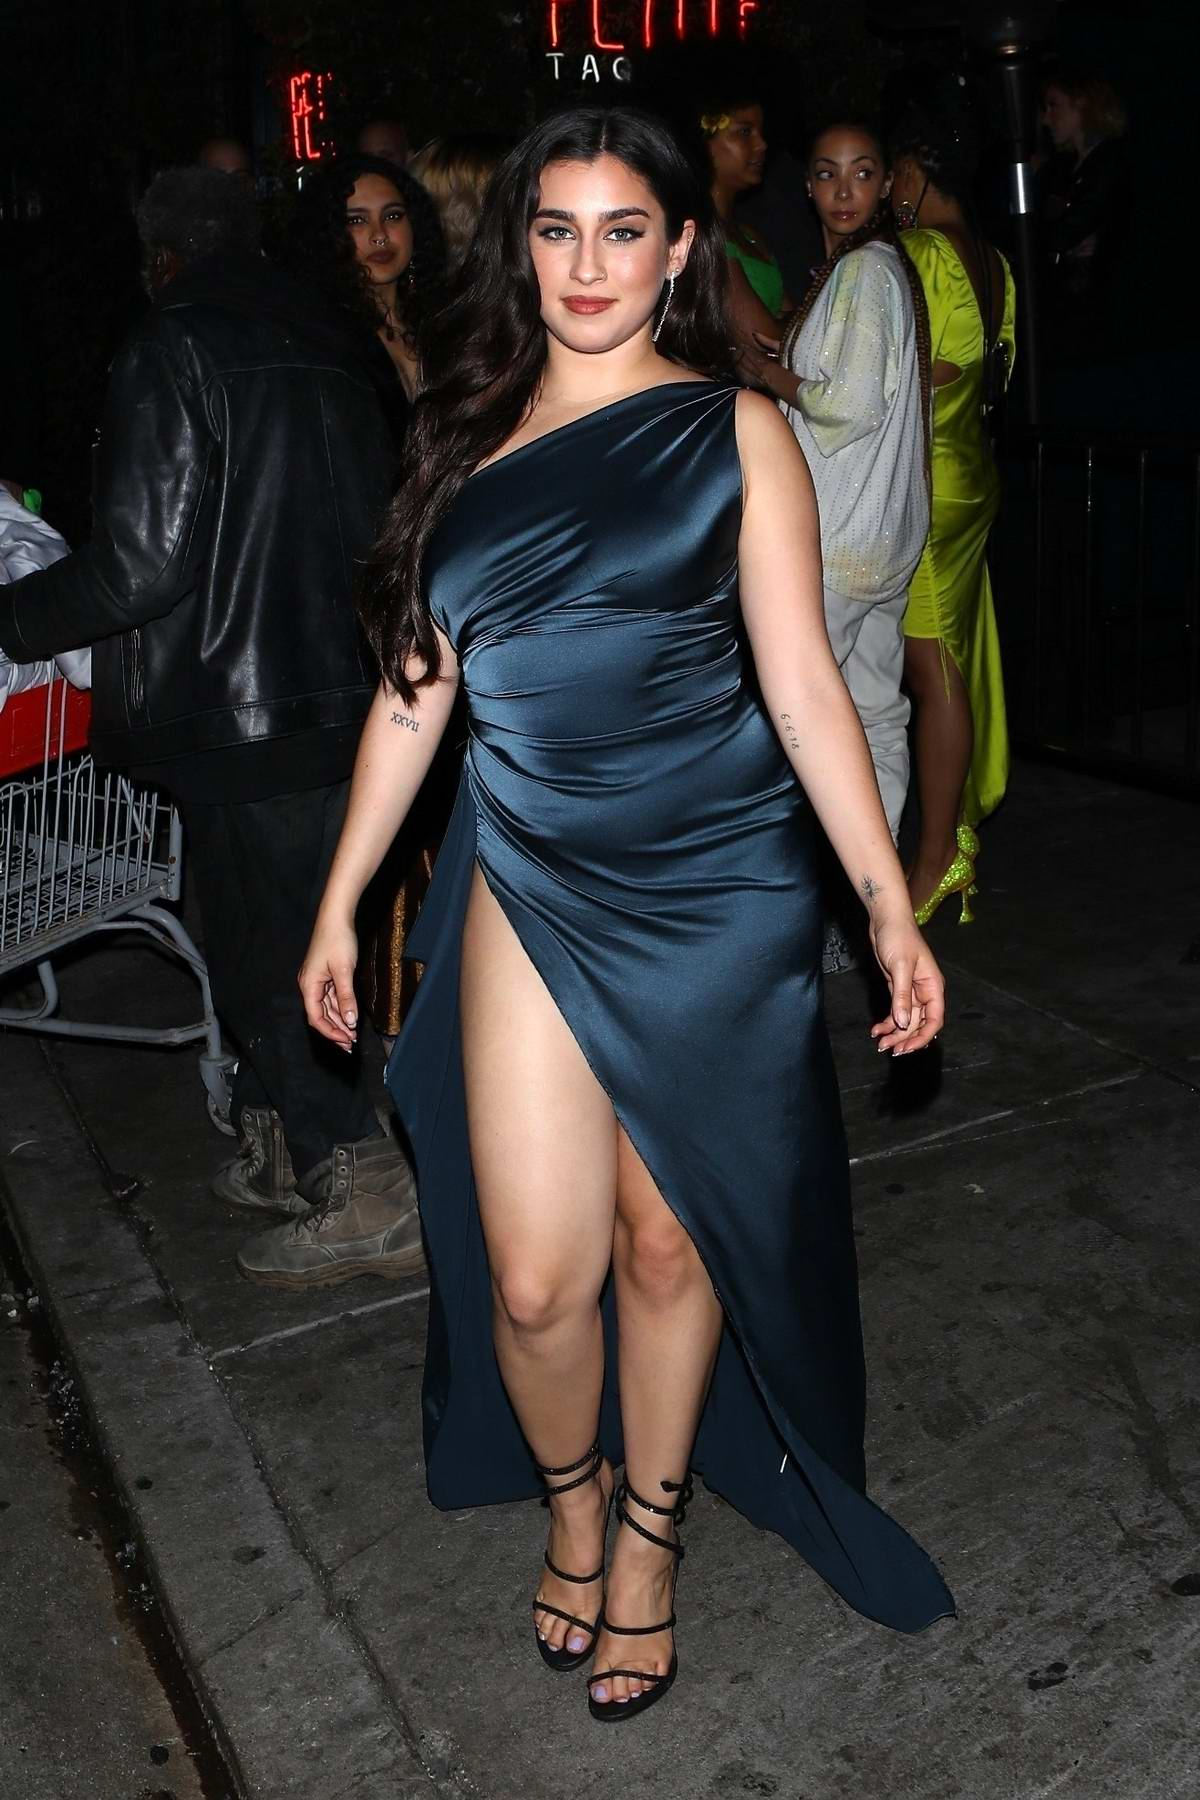 Lauren Jauregui looks stunning in a blue slit dress as she leaves Billie Eilish's Grammys After-Party in Los Angeles